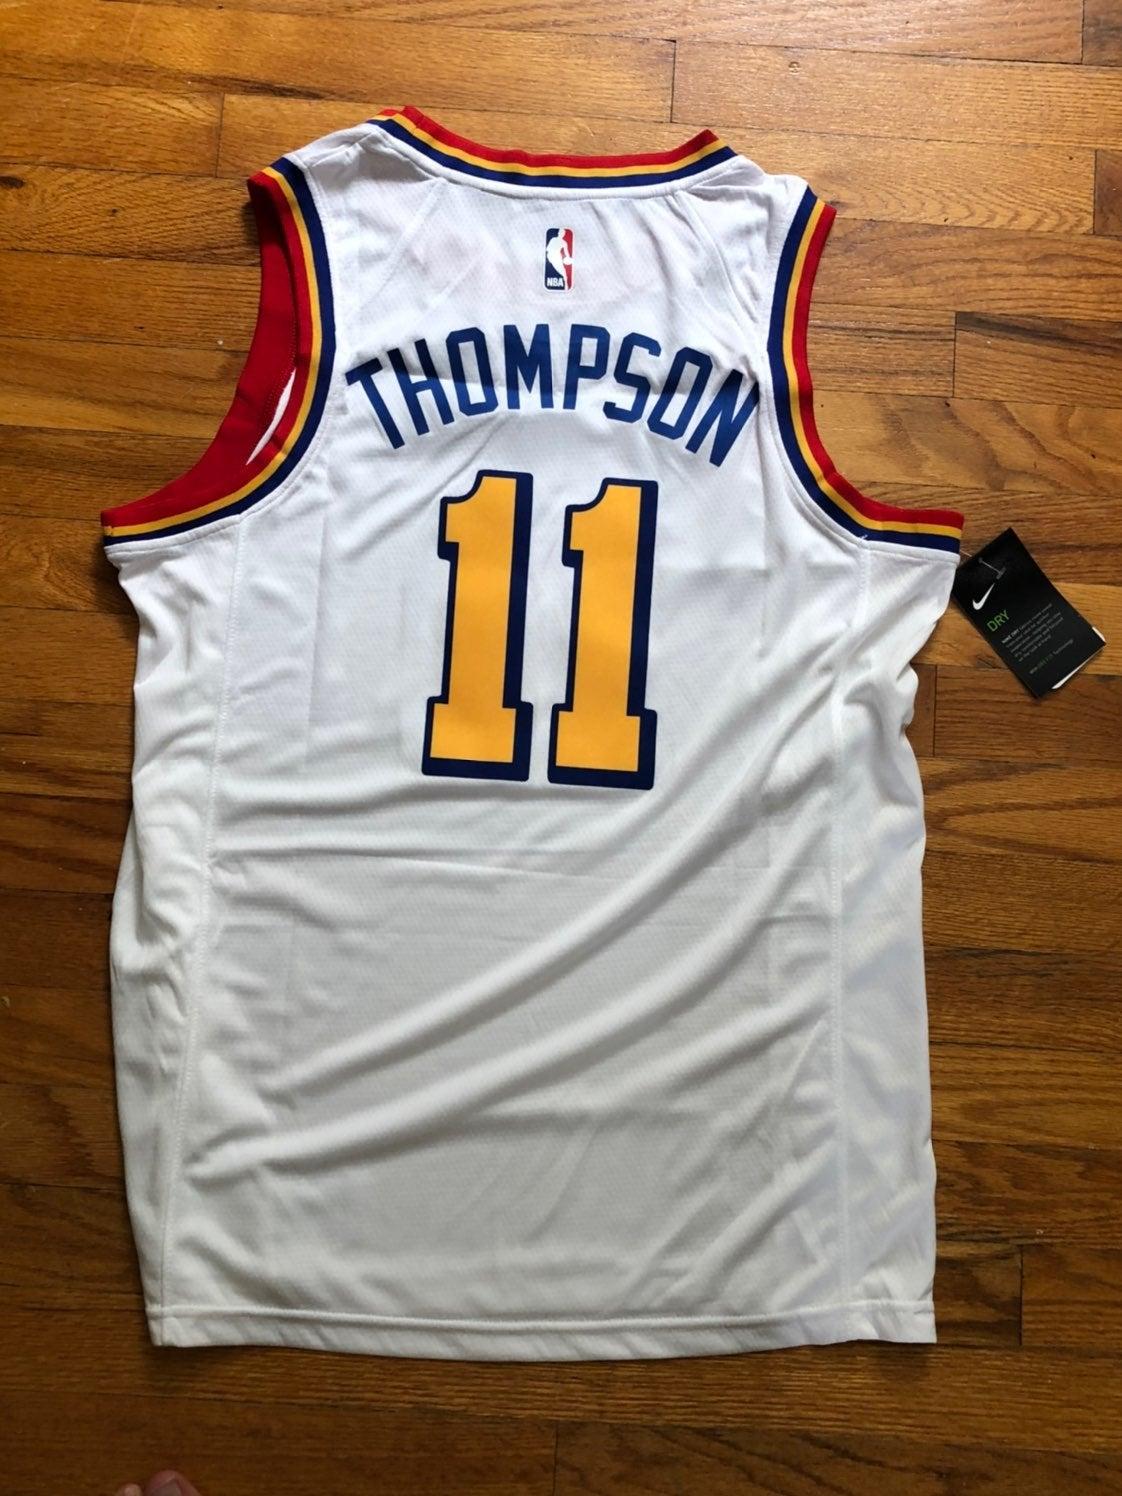 Klay Thompson Jersey Large